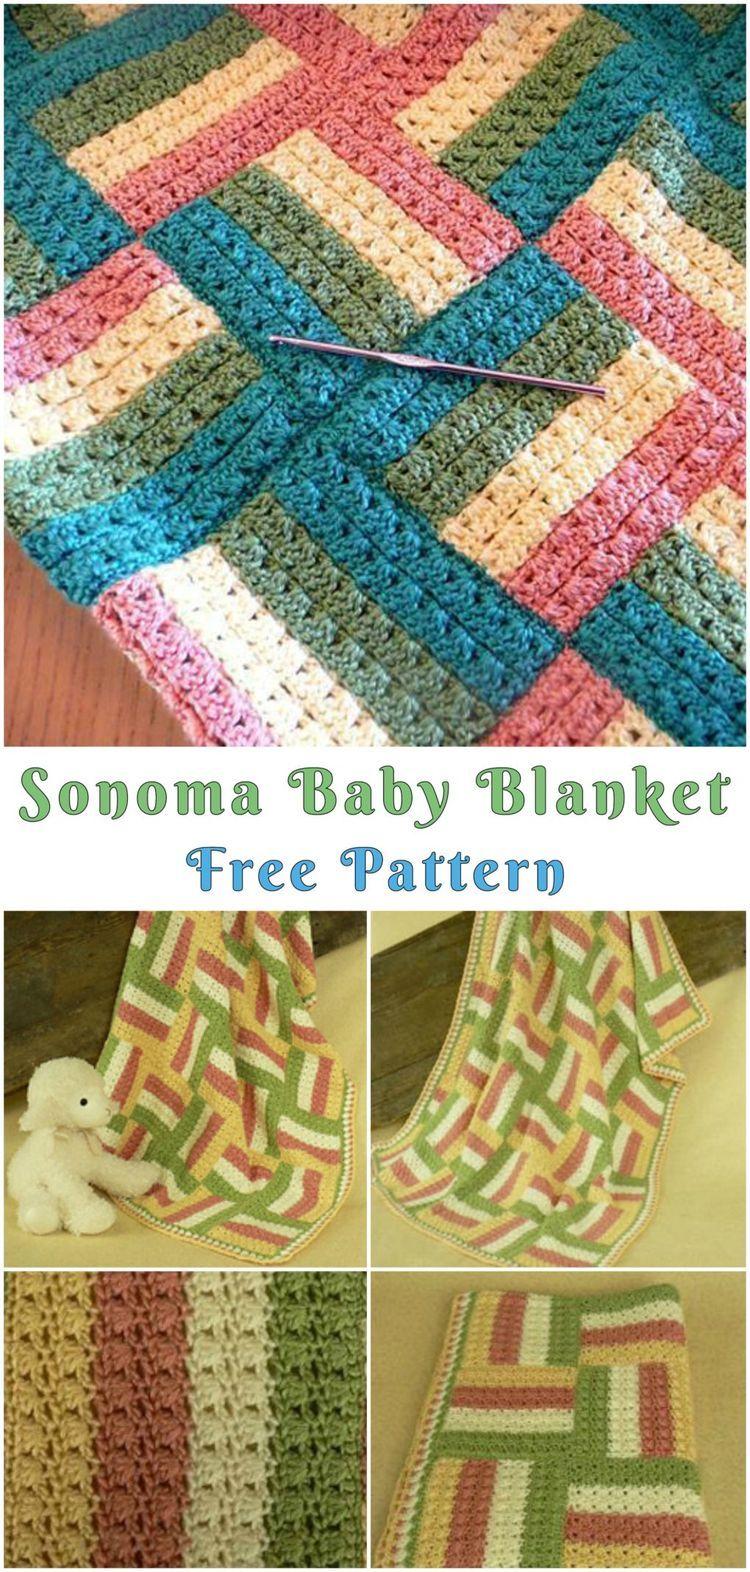 Sonoma Baby Blanket – Free Crochet Pattern | CROCHETED - Blankets ...